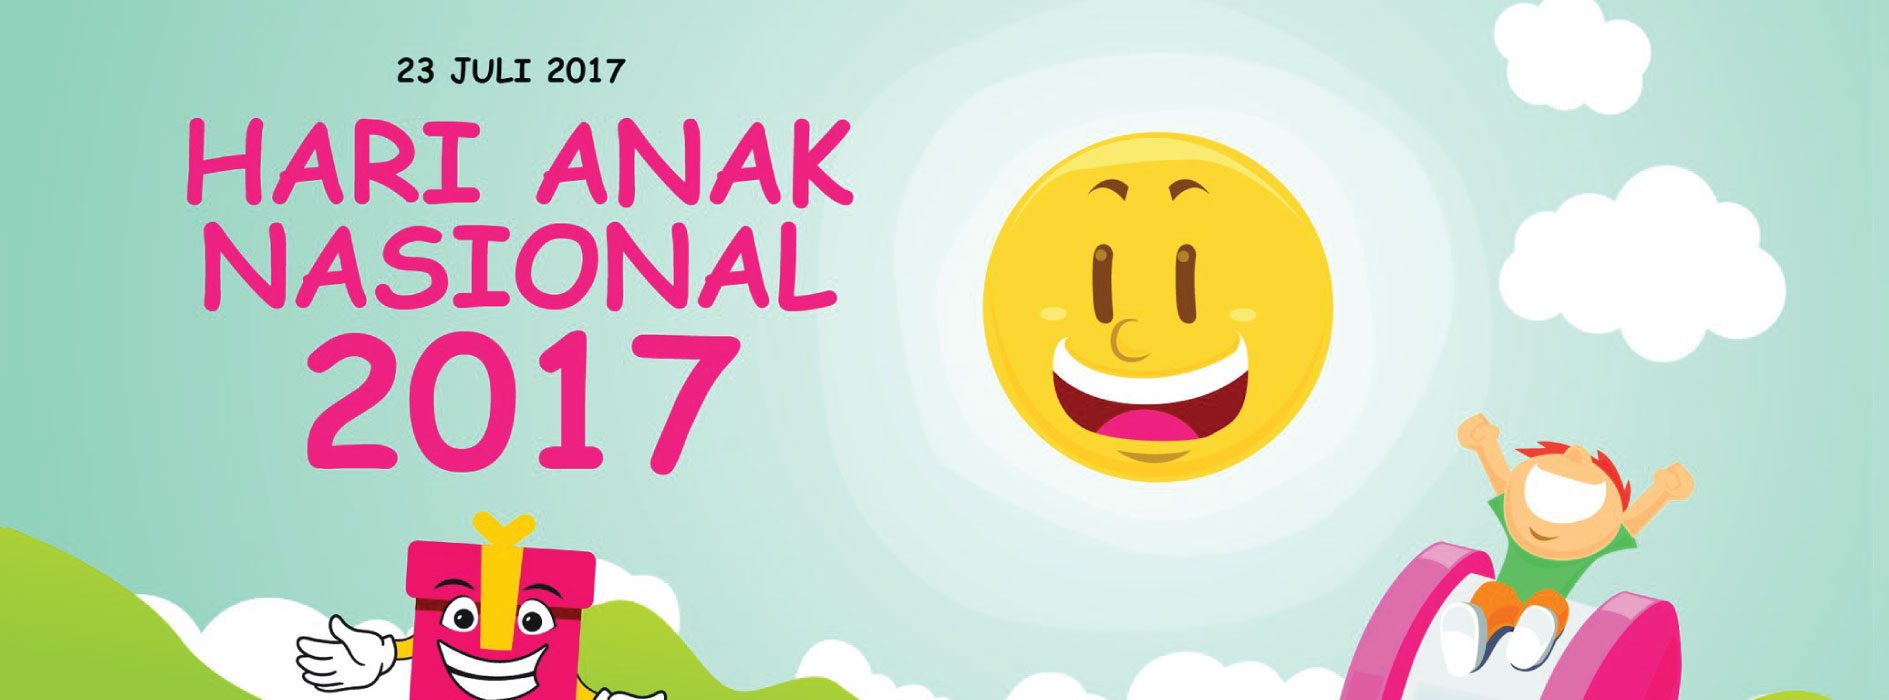 Selamat Hari Anak Nasional 2017 Sekolah Tirtamarta-BPK Penabur Pondok Indah Cinere Jakarta Depok